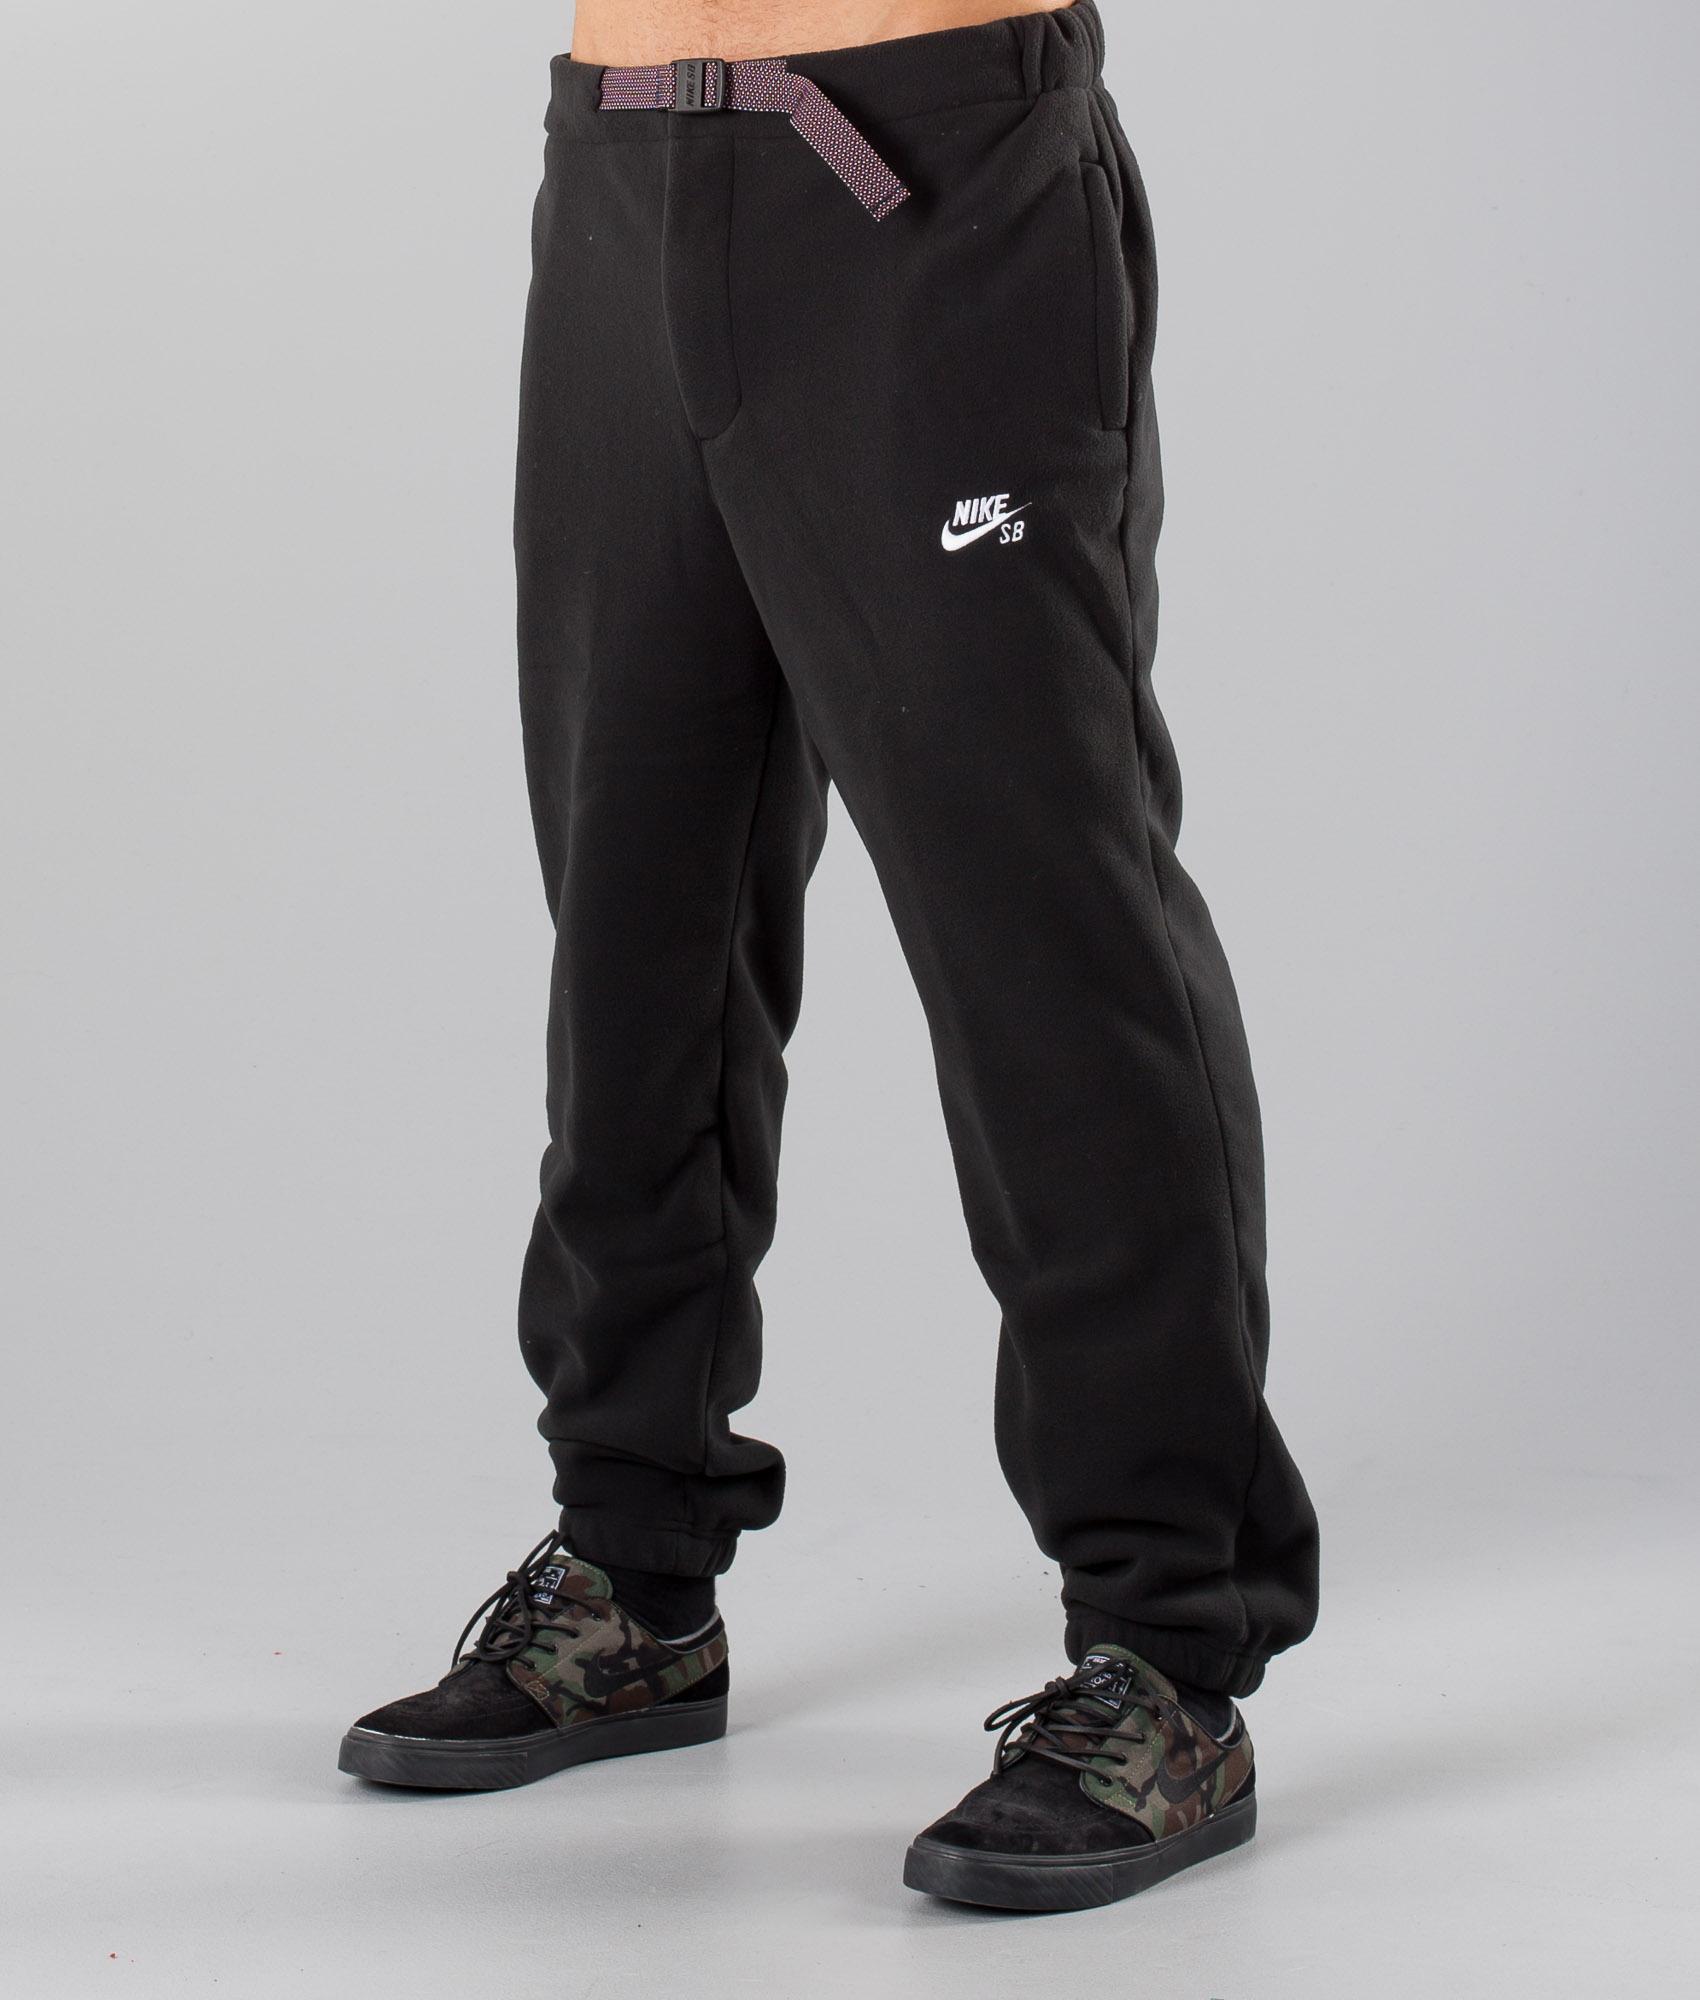 Blackwhite Pantaloni Nike Polartec it Ridestore Sb tww1EqF